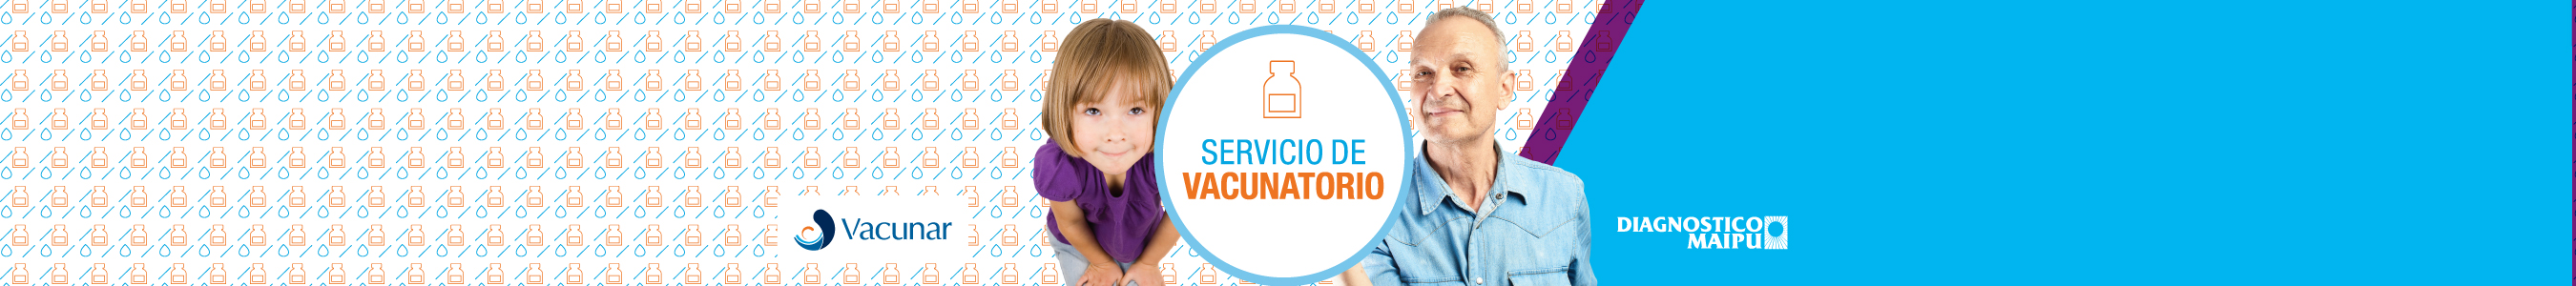 BannerWeb_Vacunatorio